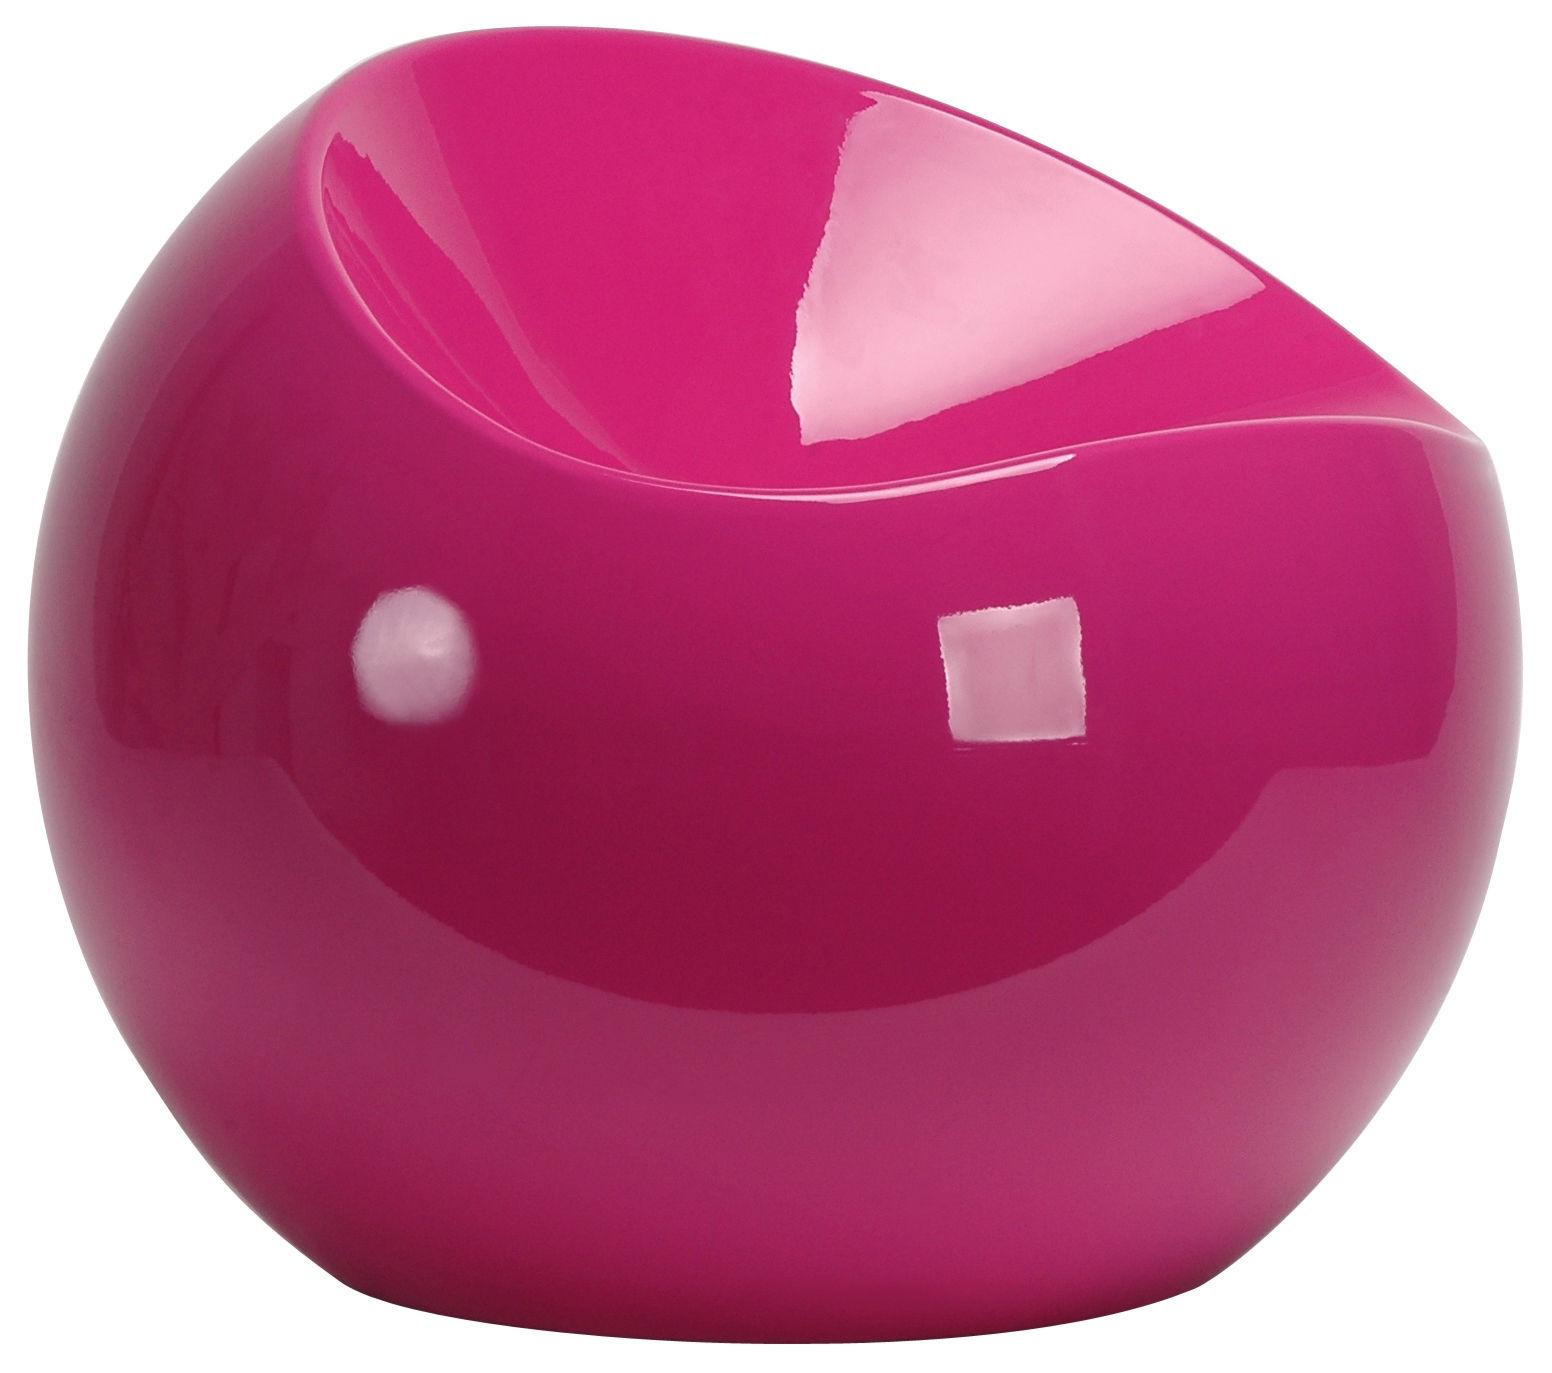 pouf ball chair fuchsia xl boom. Black Bedroom Furniture Sets. Home Design Ideas